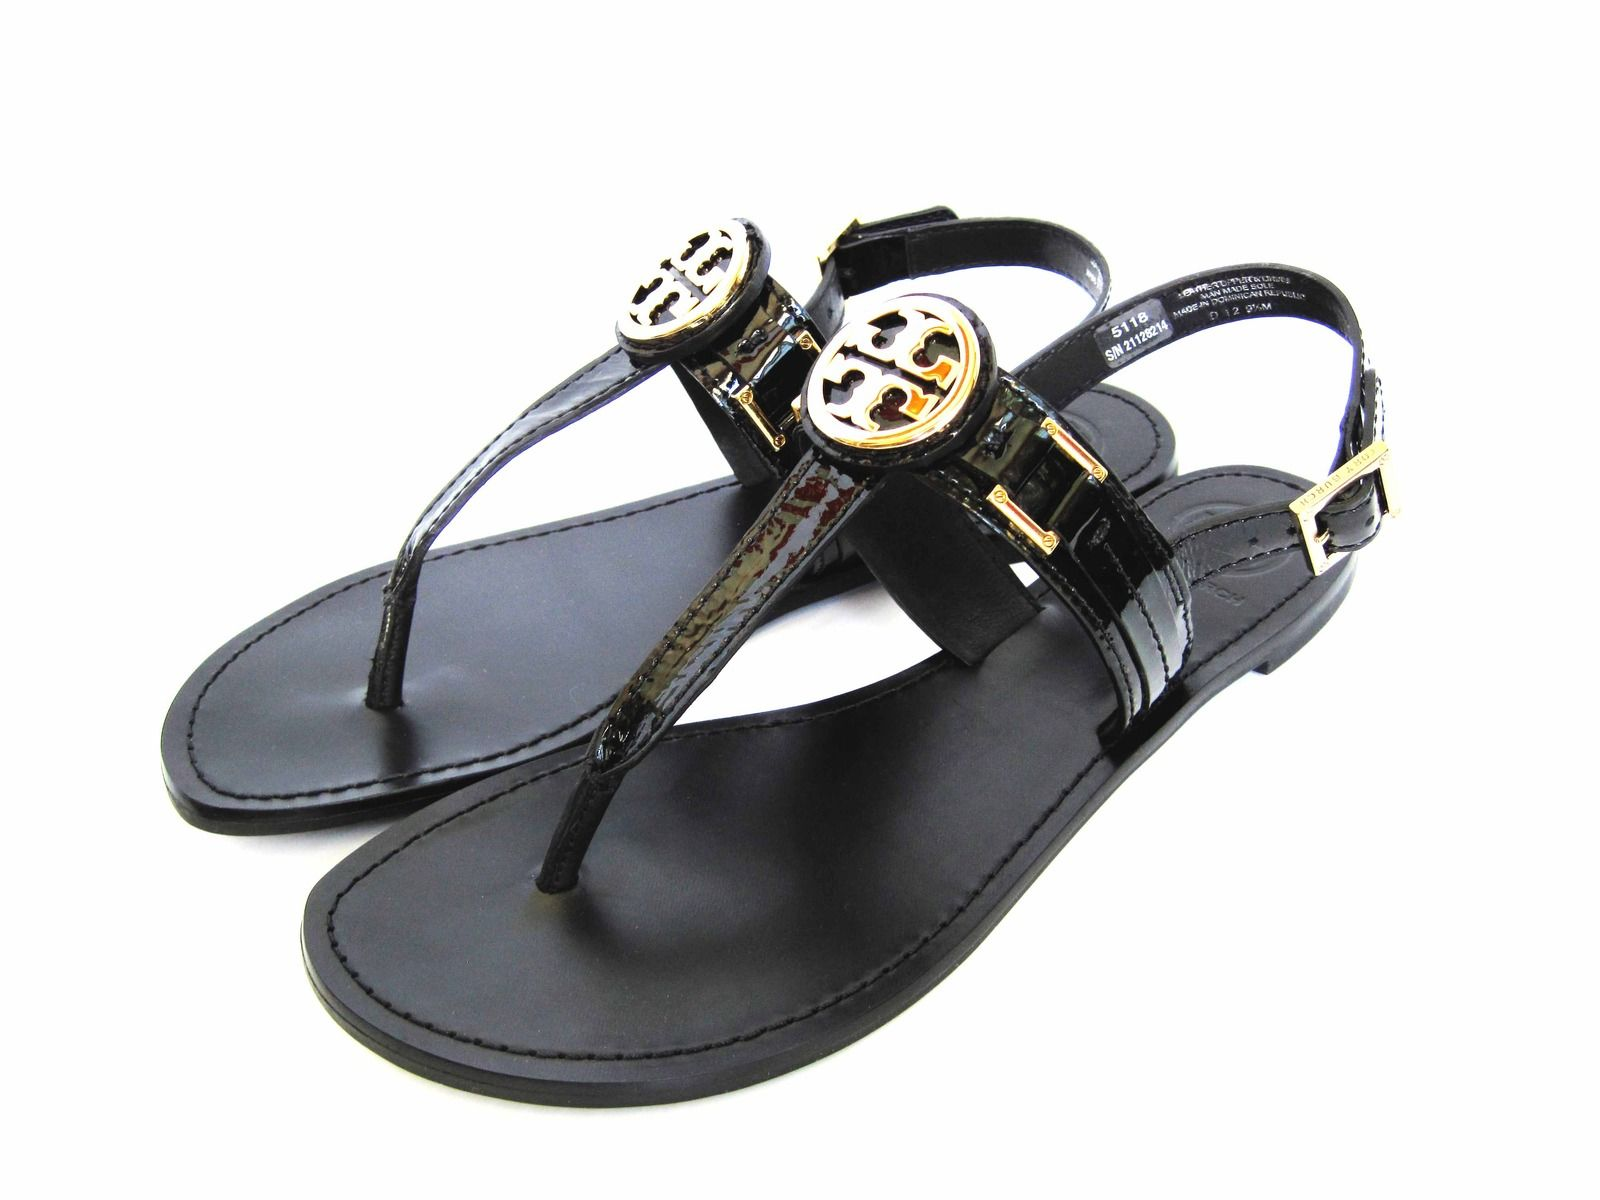 905d27323e Tory Burch Sandals | Wish List | Black sandals, Tory burch, Sandals